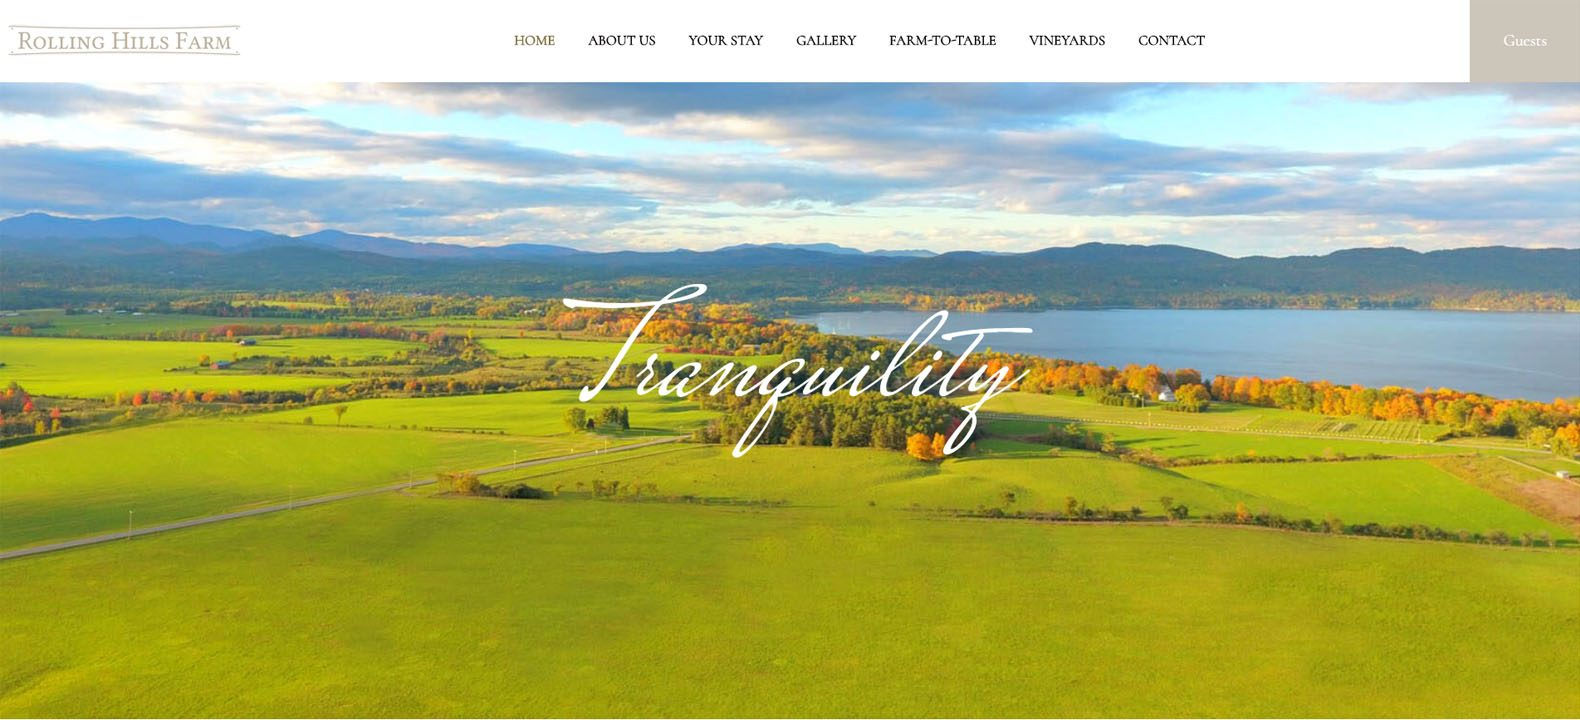 New York farm stay website